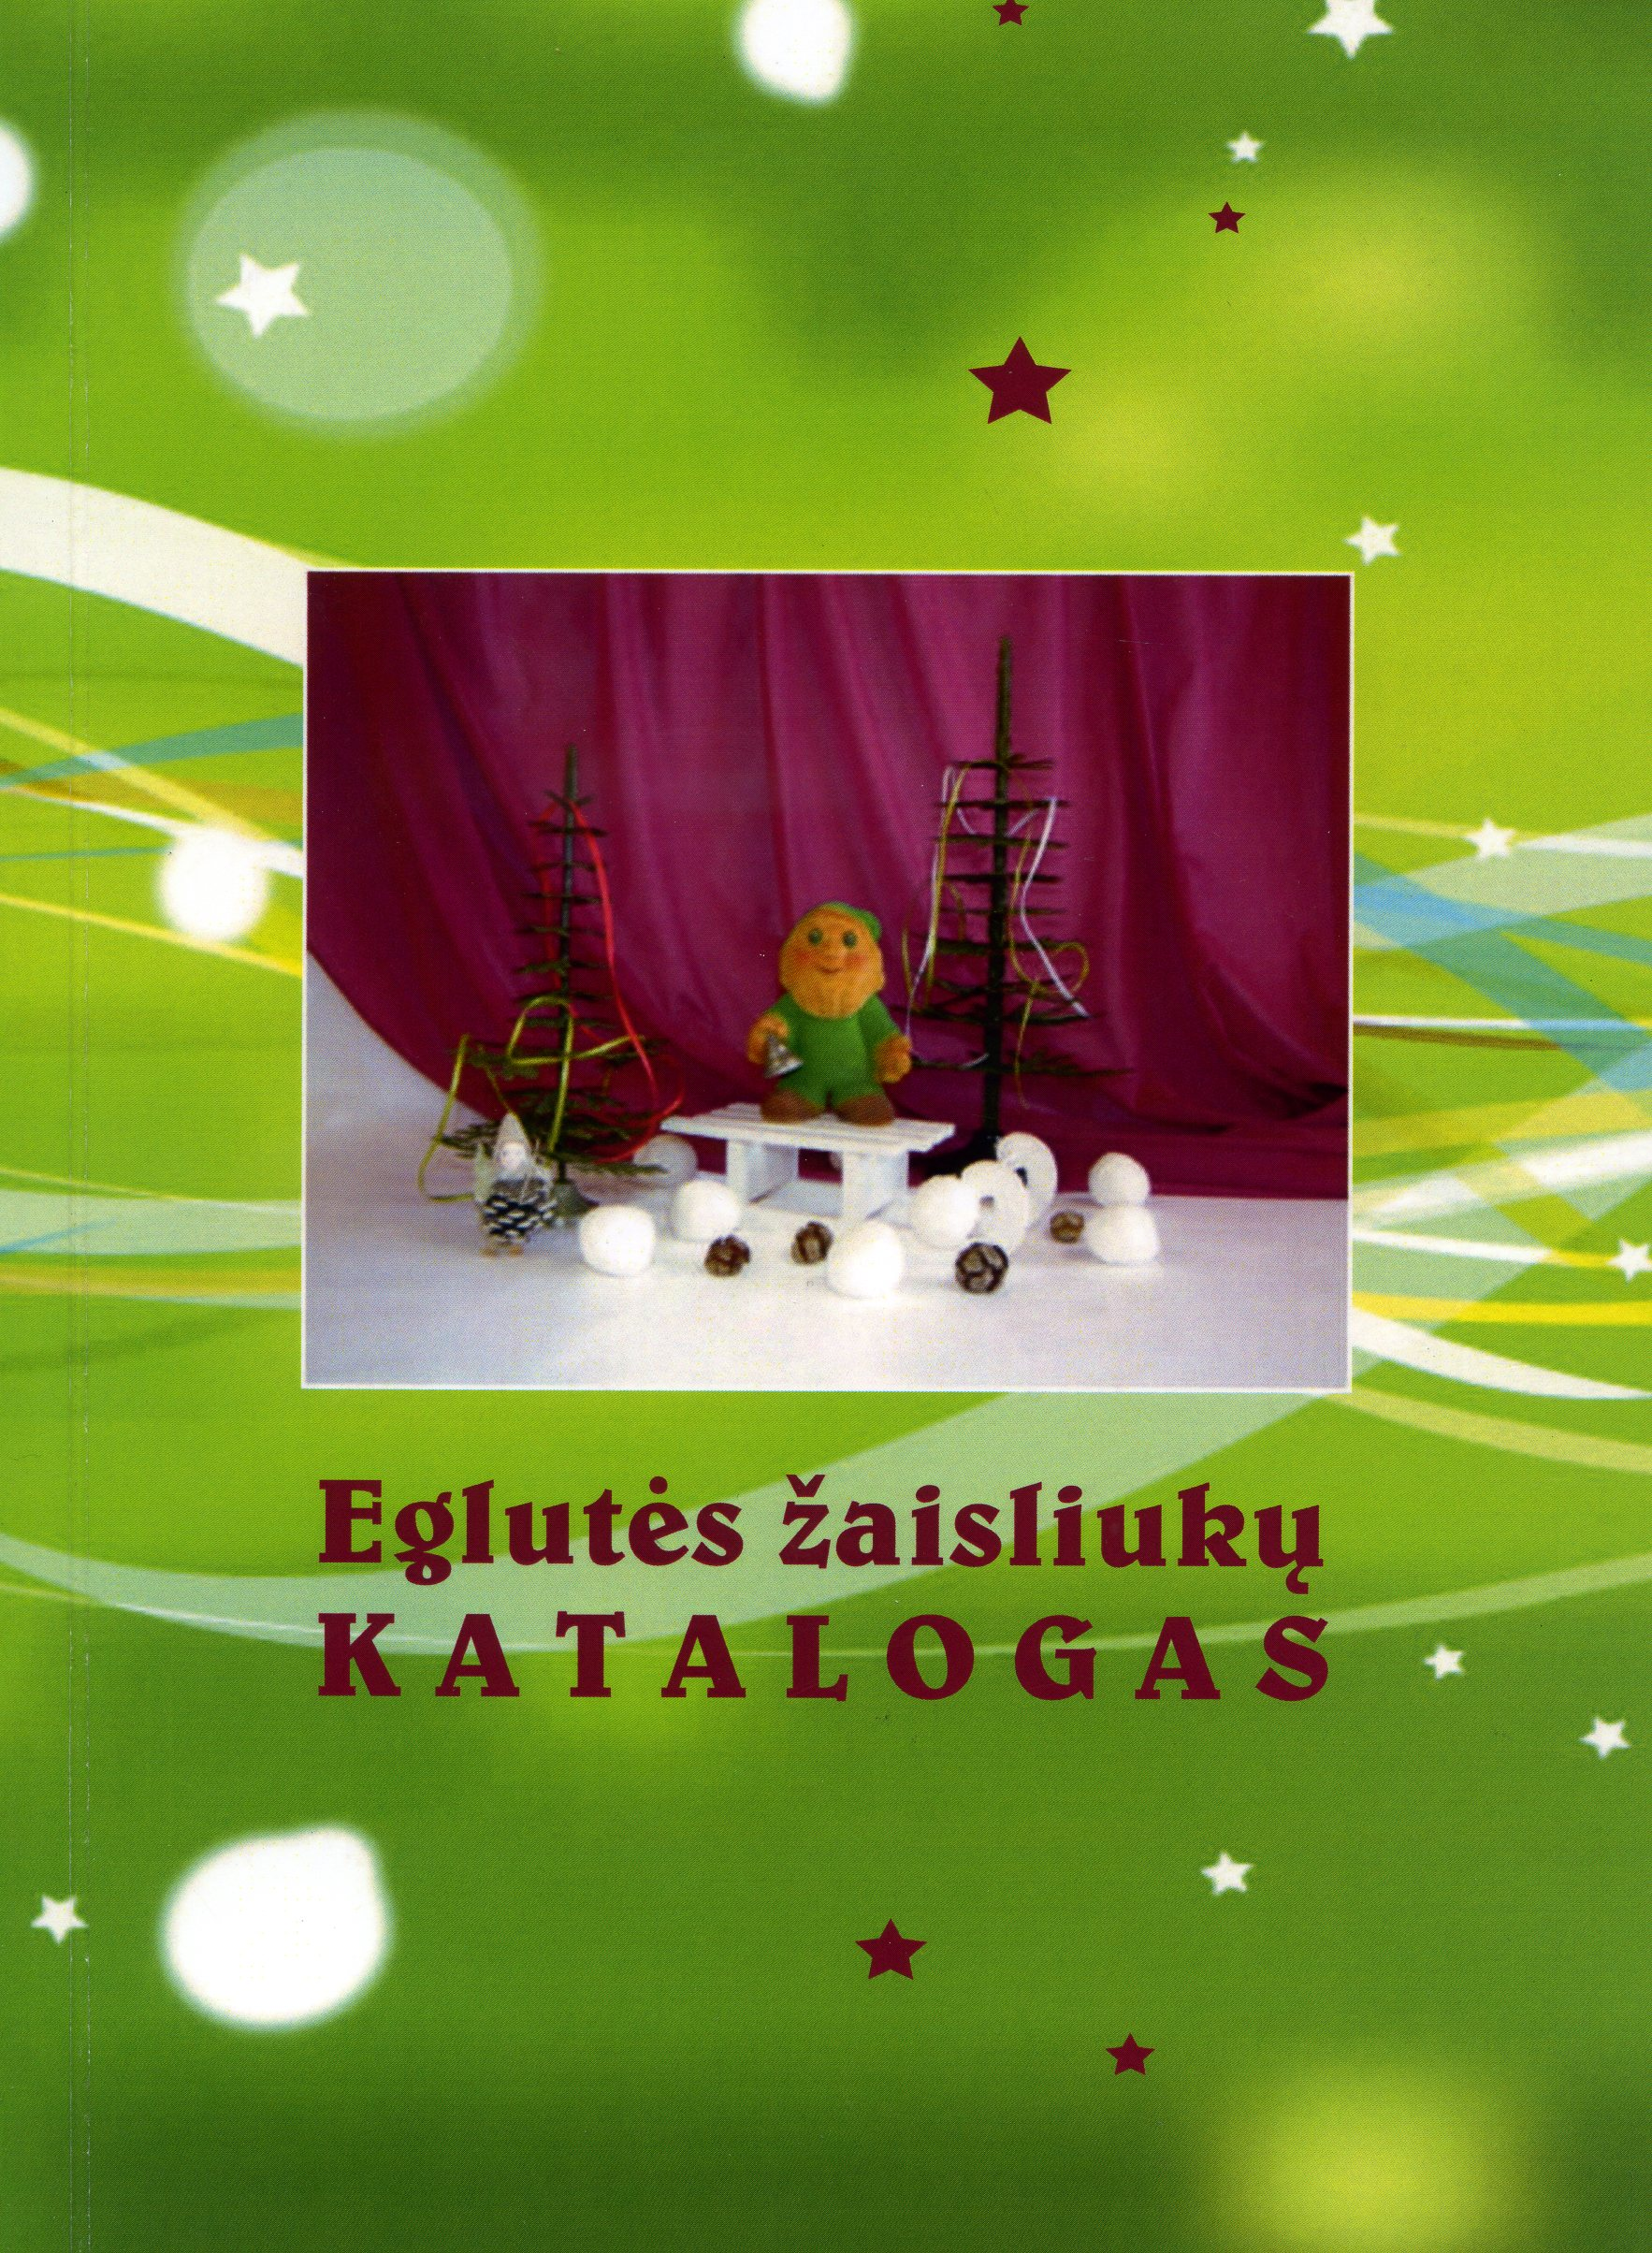 Eglutes žaisliukų katalogas